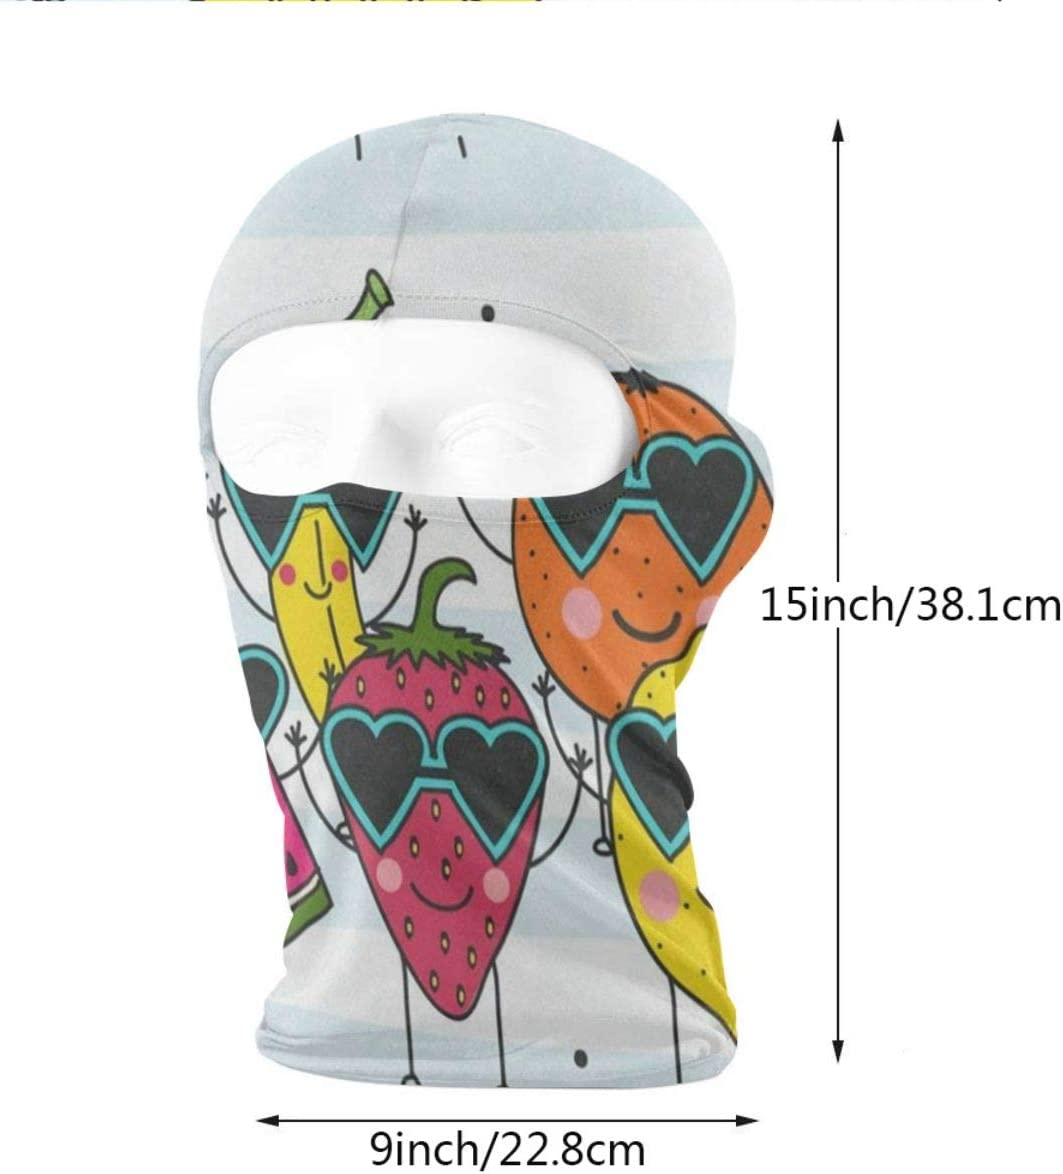 IDO Hipster Cat Kitten Floral Full Face Masks UV Balaclava Protection Ski Headwear Motorcycle Neck Warmer Youth Women Men